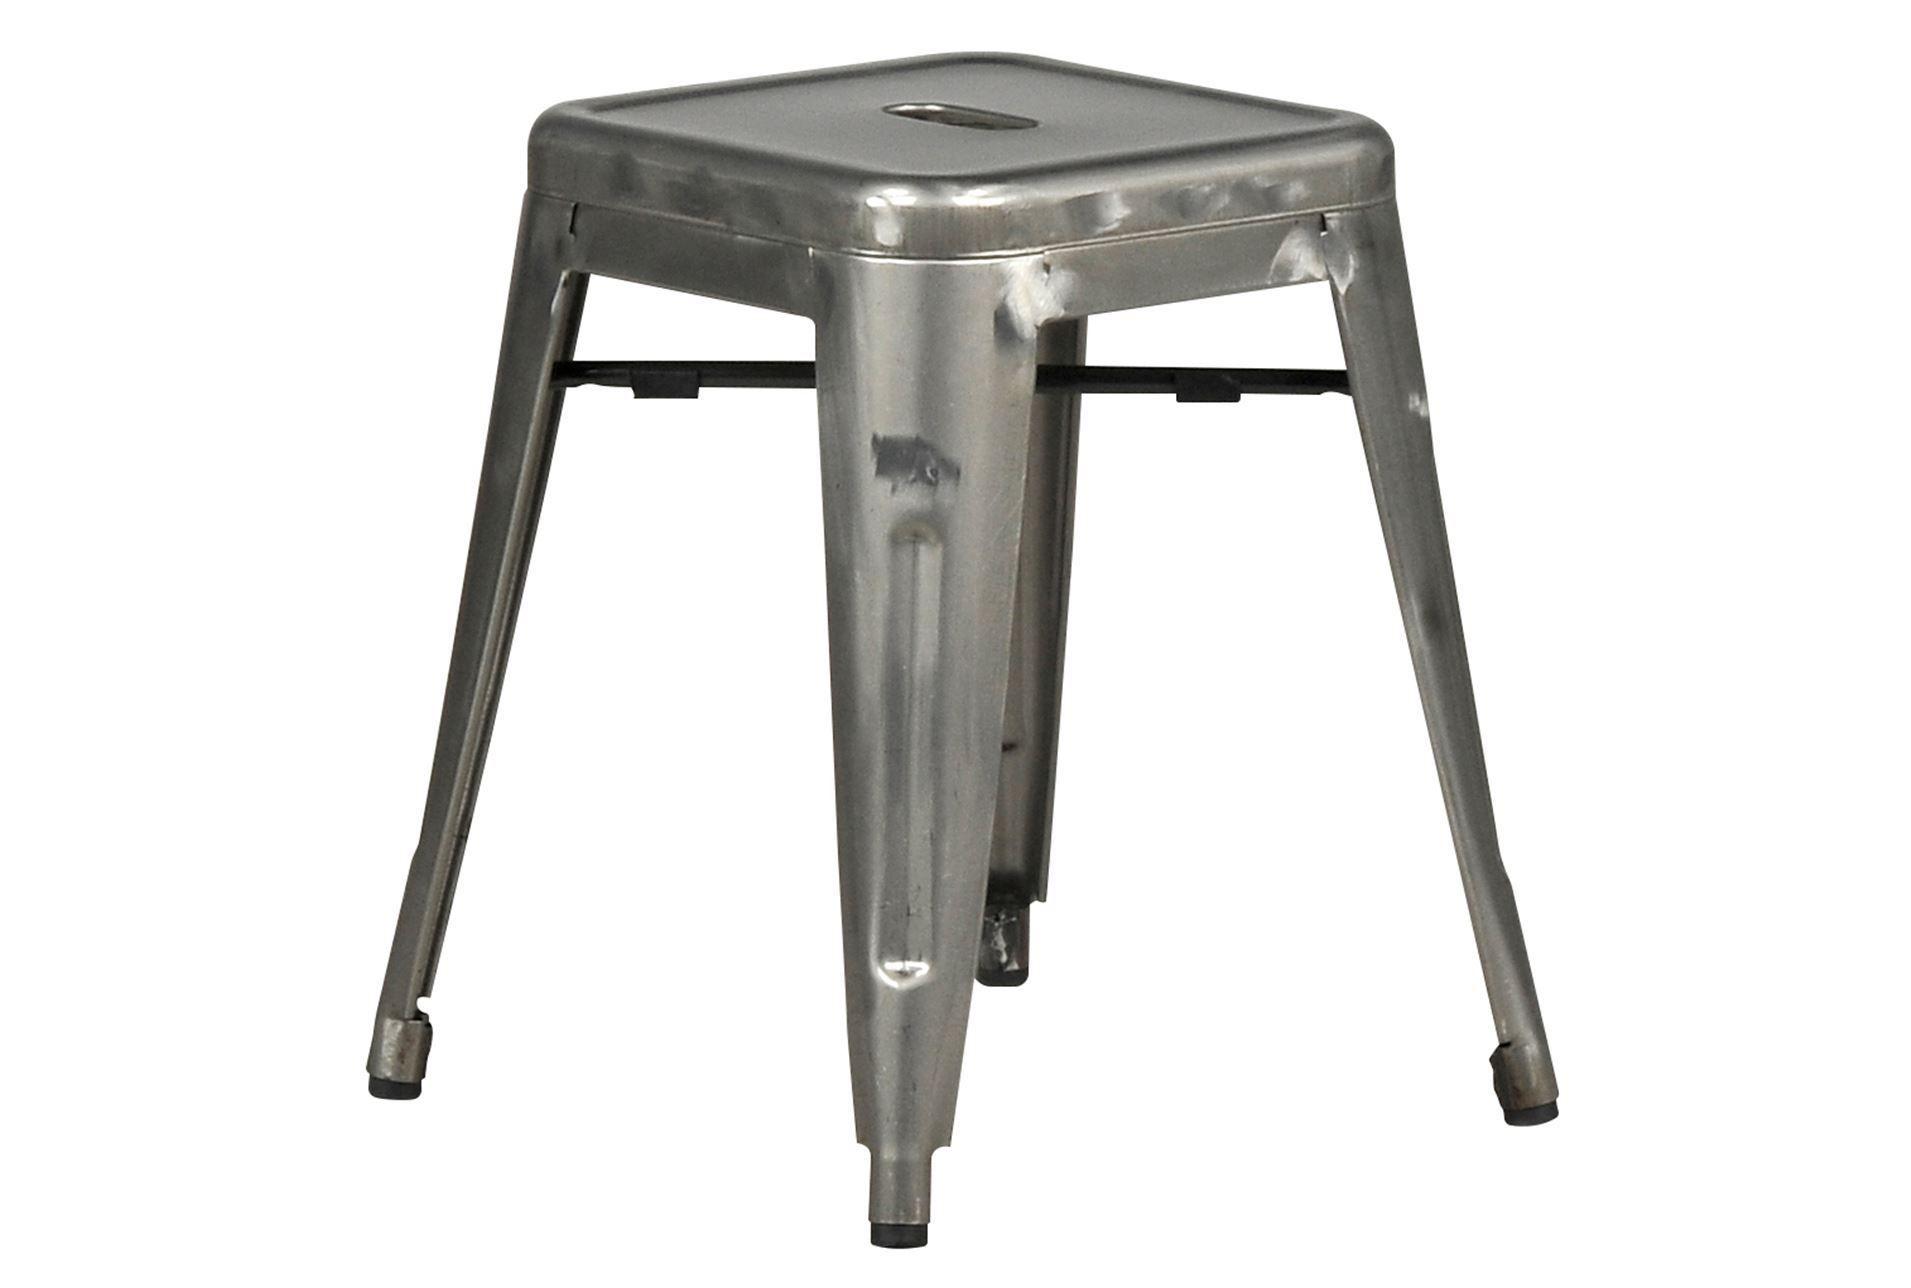 Stupendous Cooper 18 Inch Metal Backless Stool Kitchen Gear Stool Creativecarmelina Interior Chair Design Creativecarmelinacom